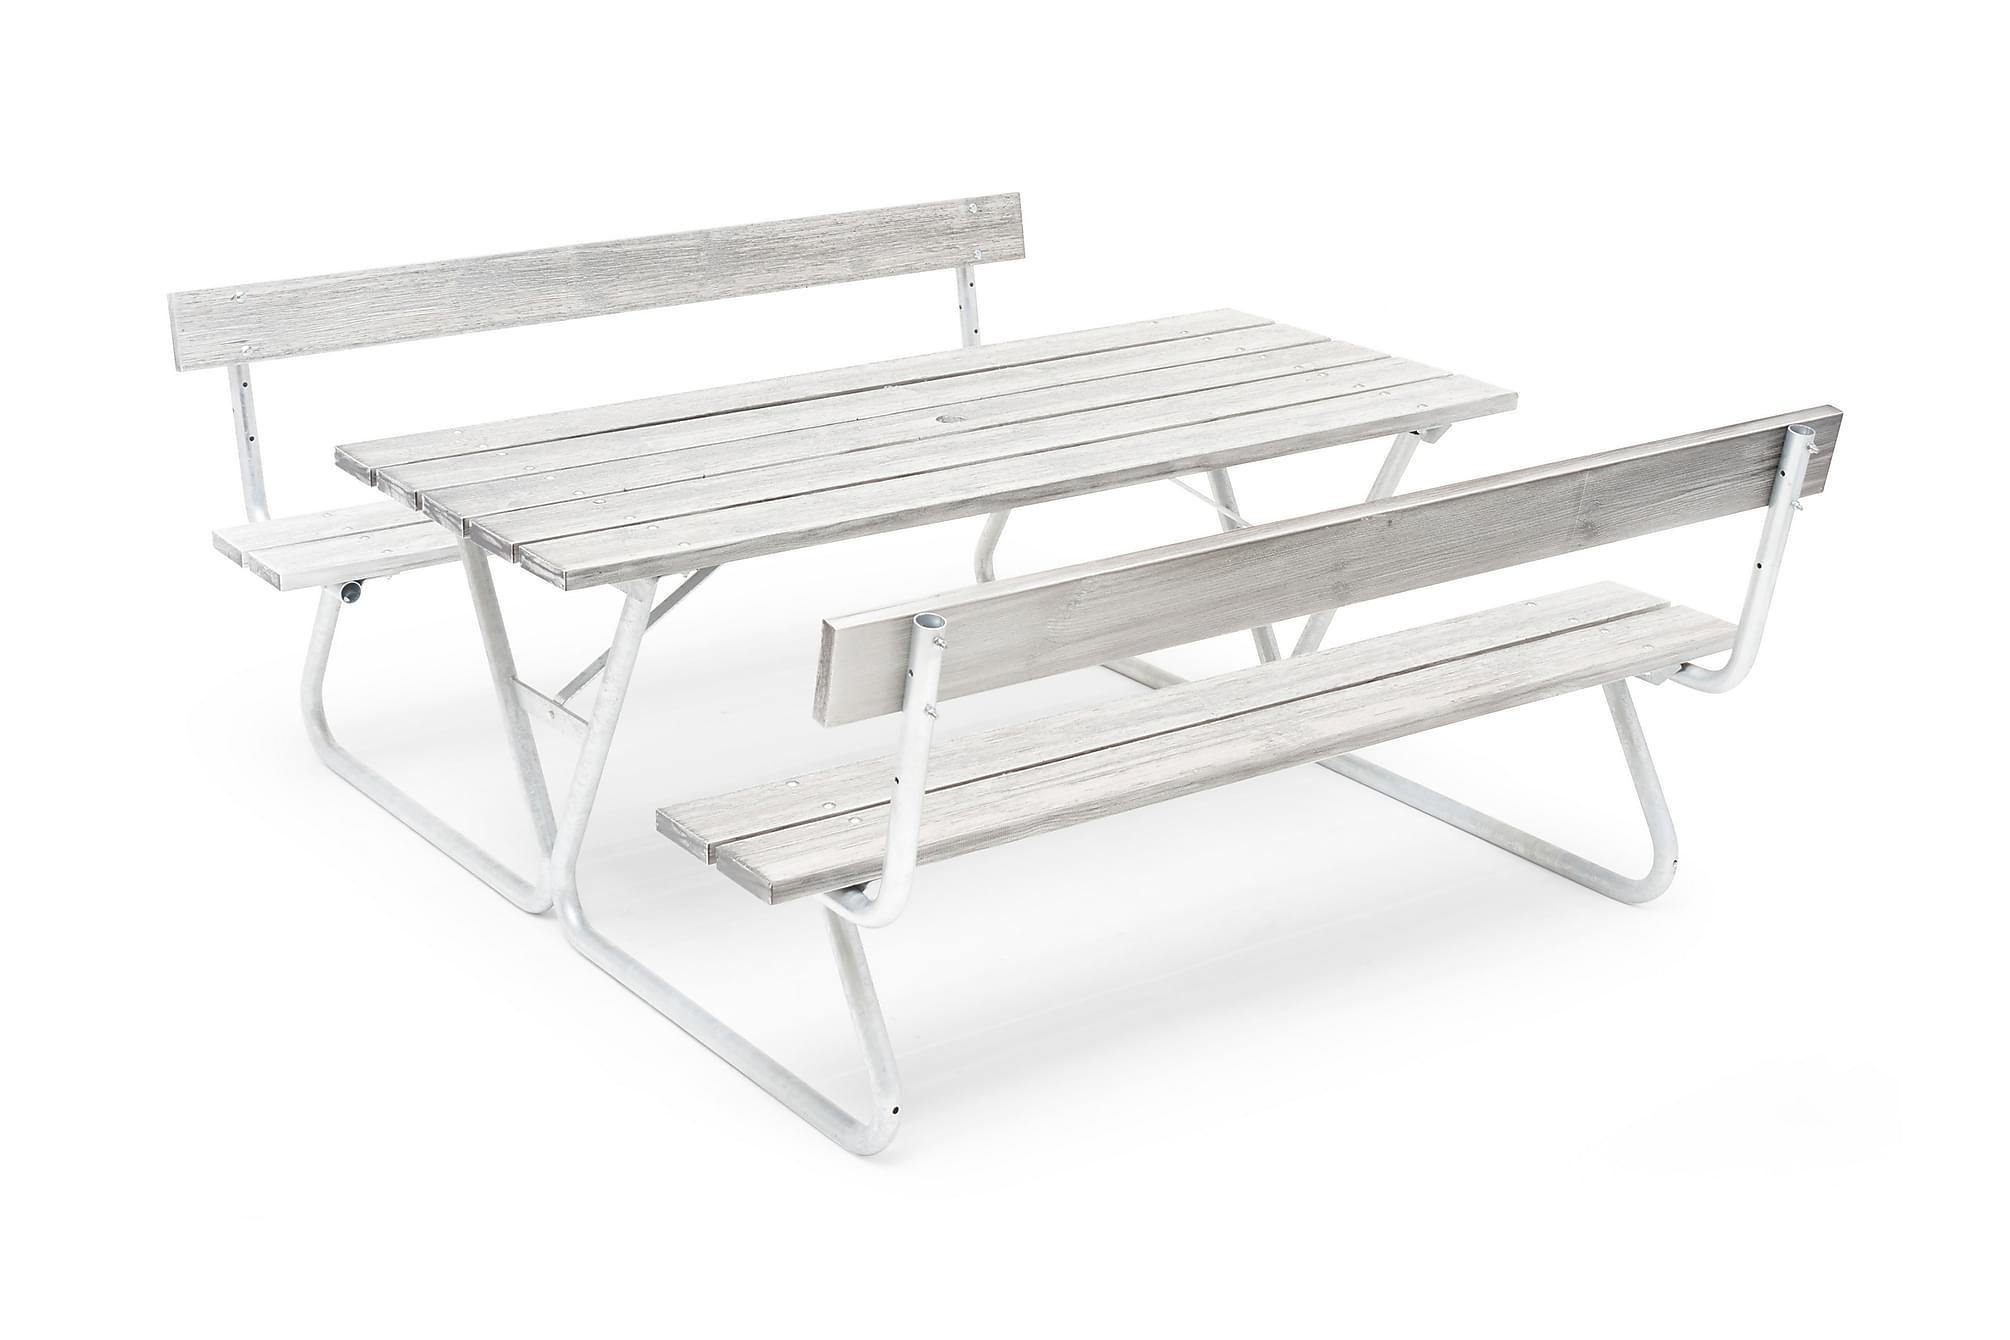 HILLERSTORP PICNIC Picknickbord Bastant Med Rygg Whitewash, Bänkbord